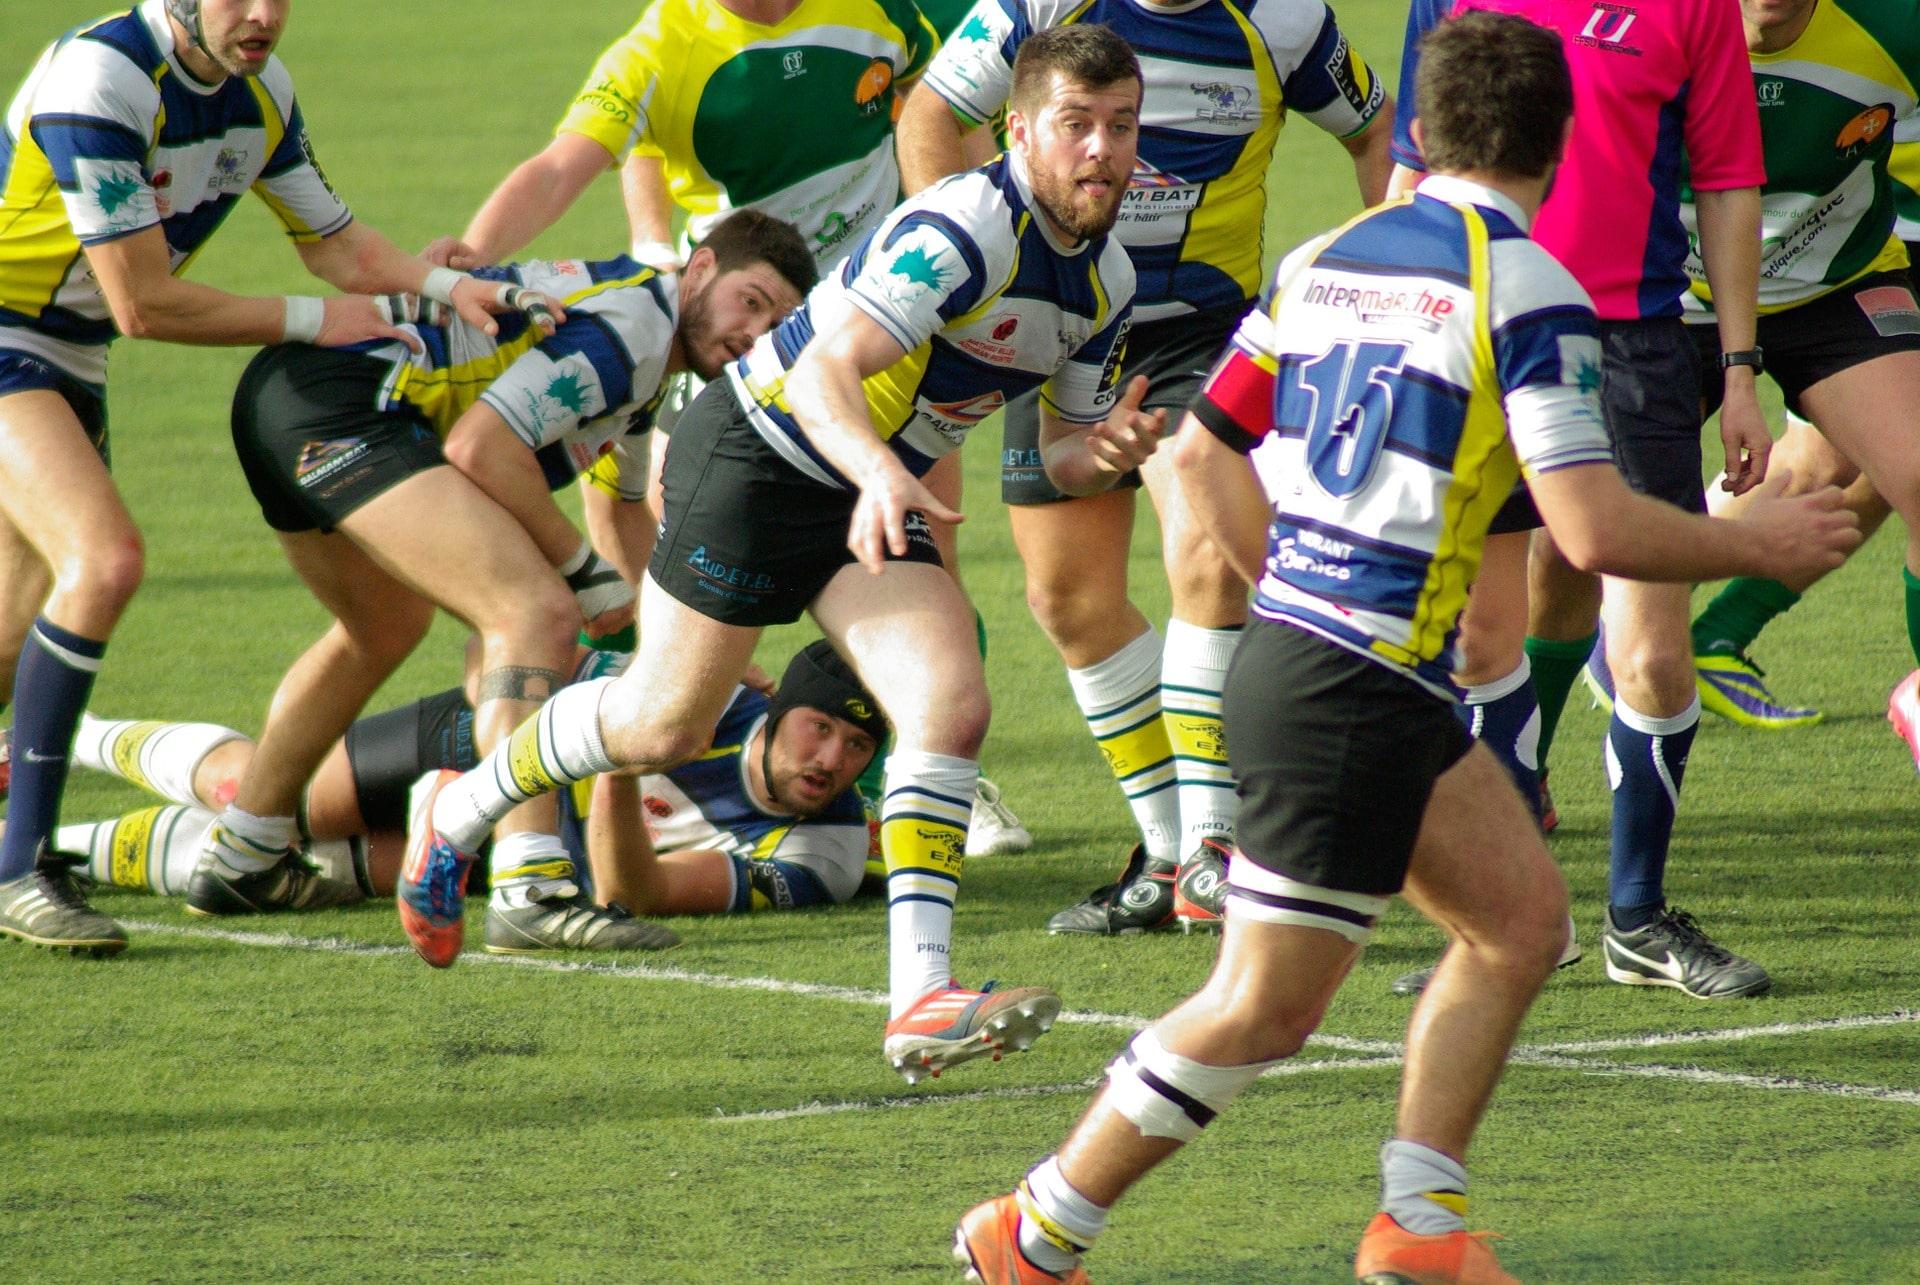 rugby-655034_1920-min.jpg